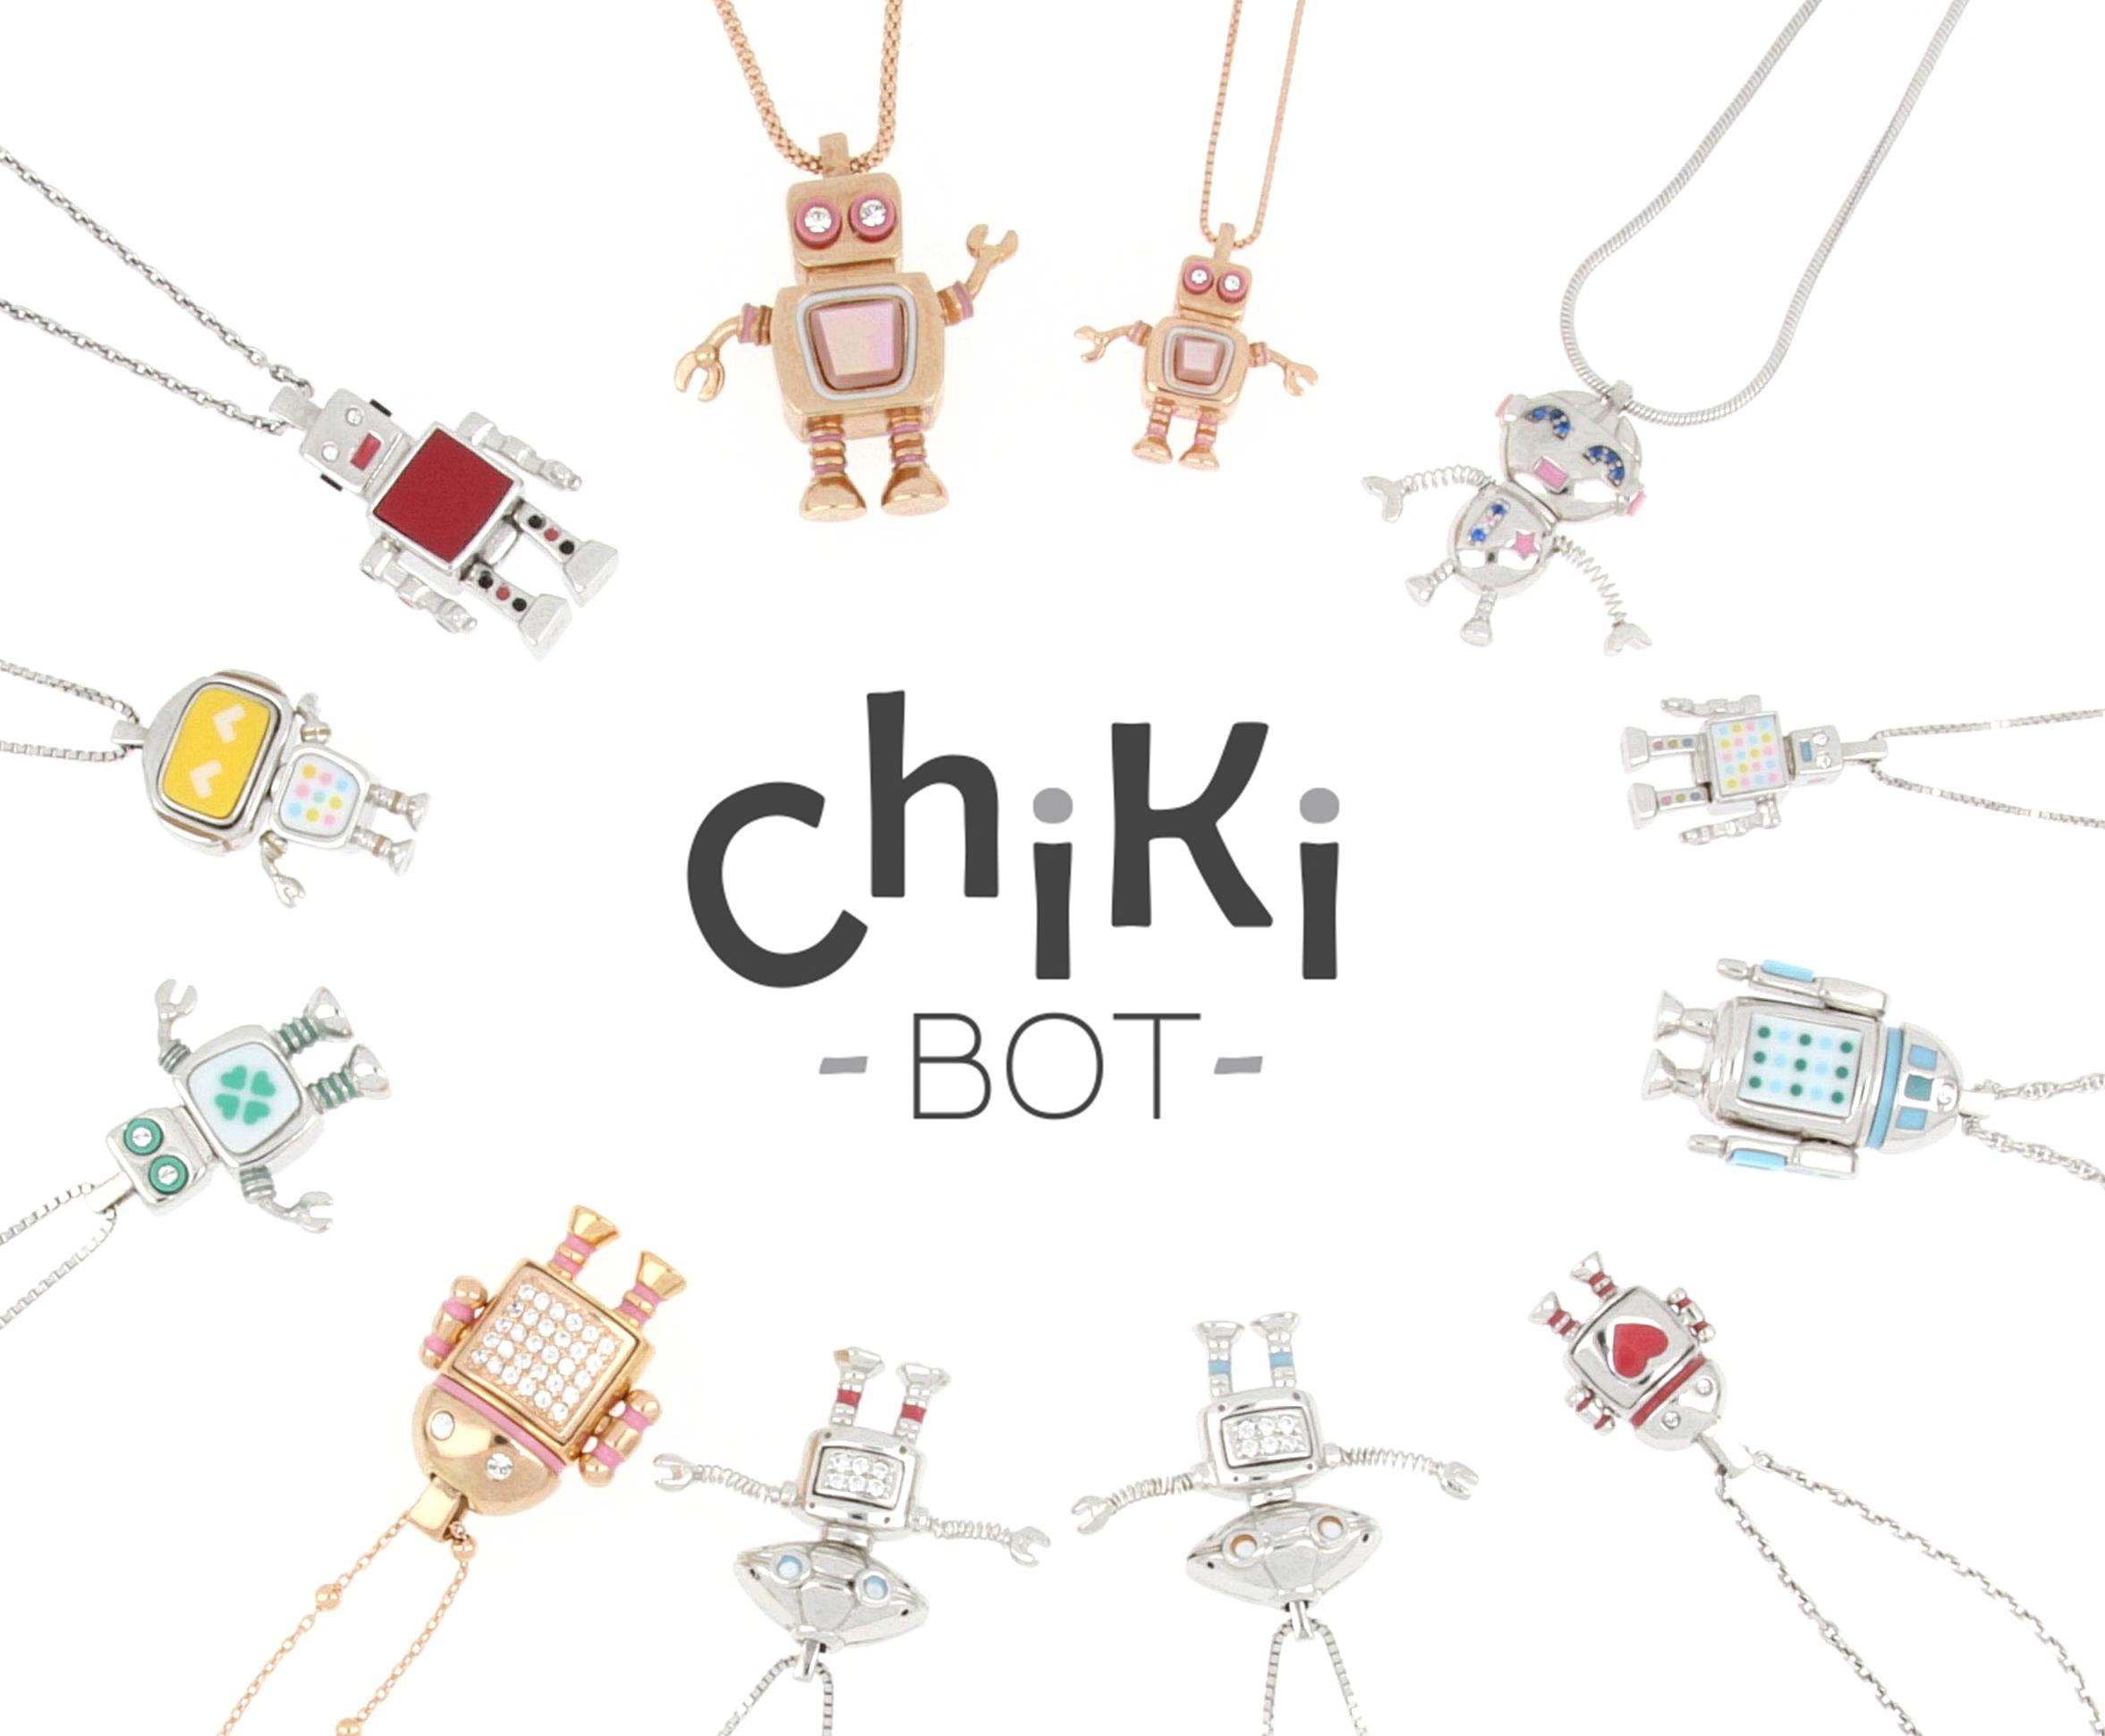 chikibot-family-logo.jpg